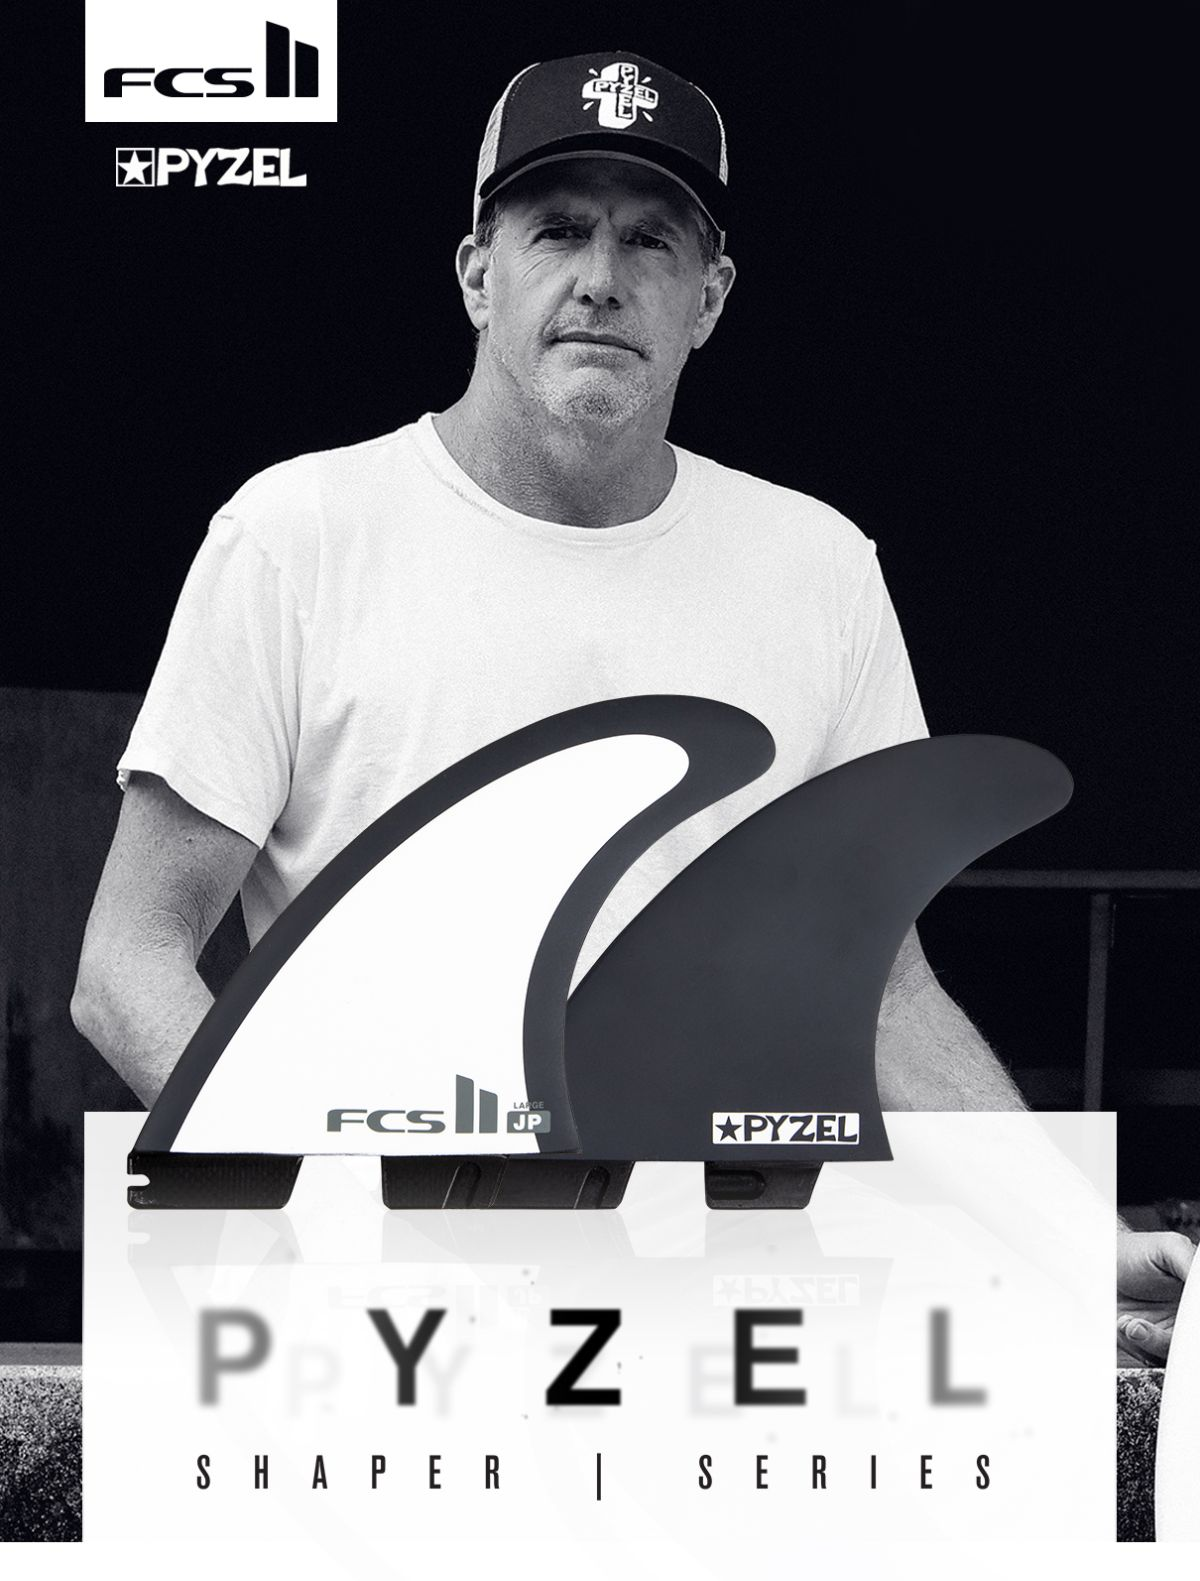 FCS II Jon Pyzel Medium and Large fins